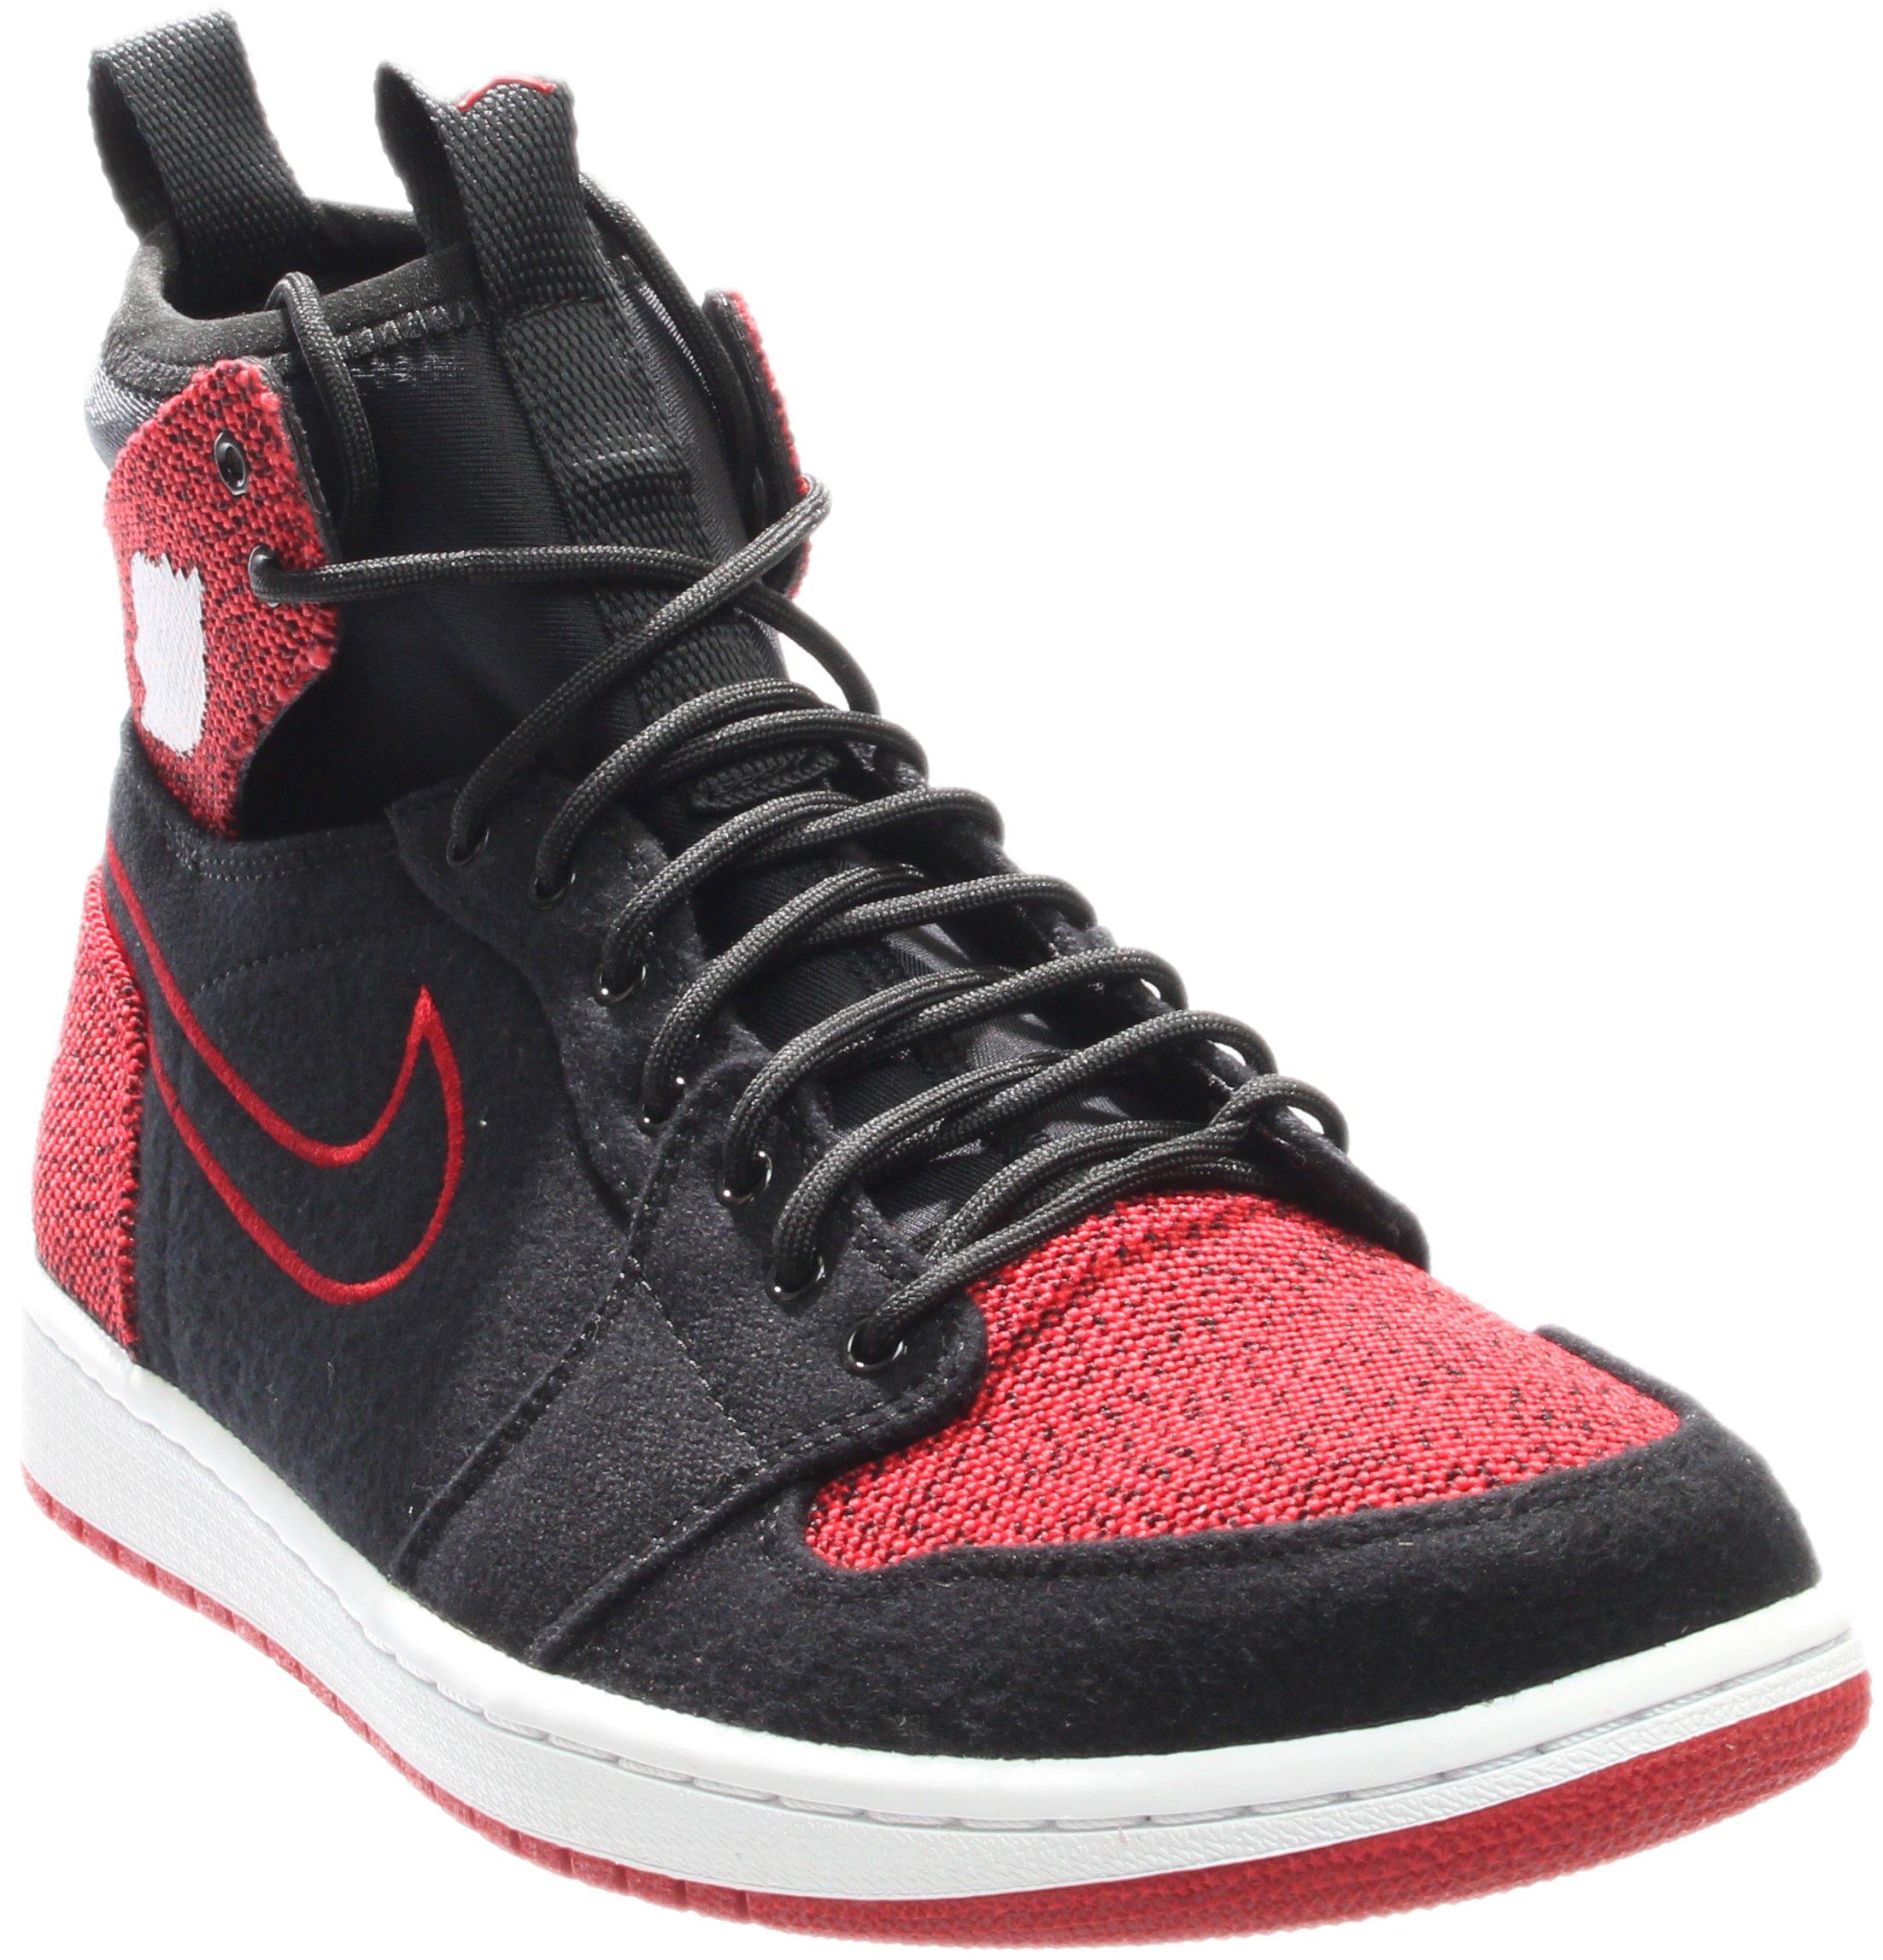 65a7026681c Galleon - Nike Jordan Men's Air Jordan 1 Retro Ultra High Black/Gym Red/ Black/White Basketball Shoe 10 Men US